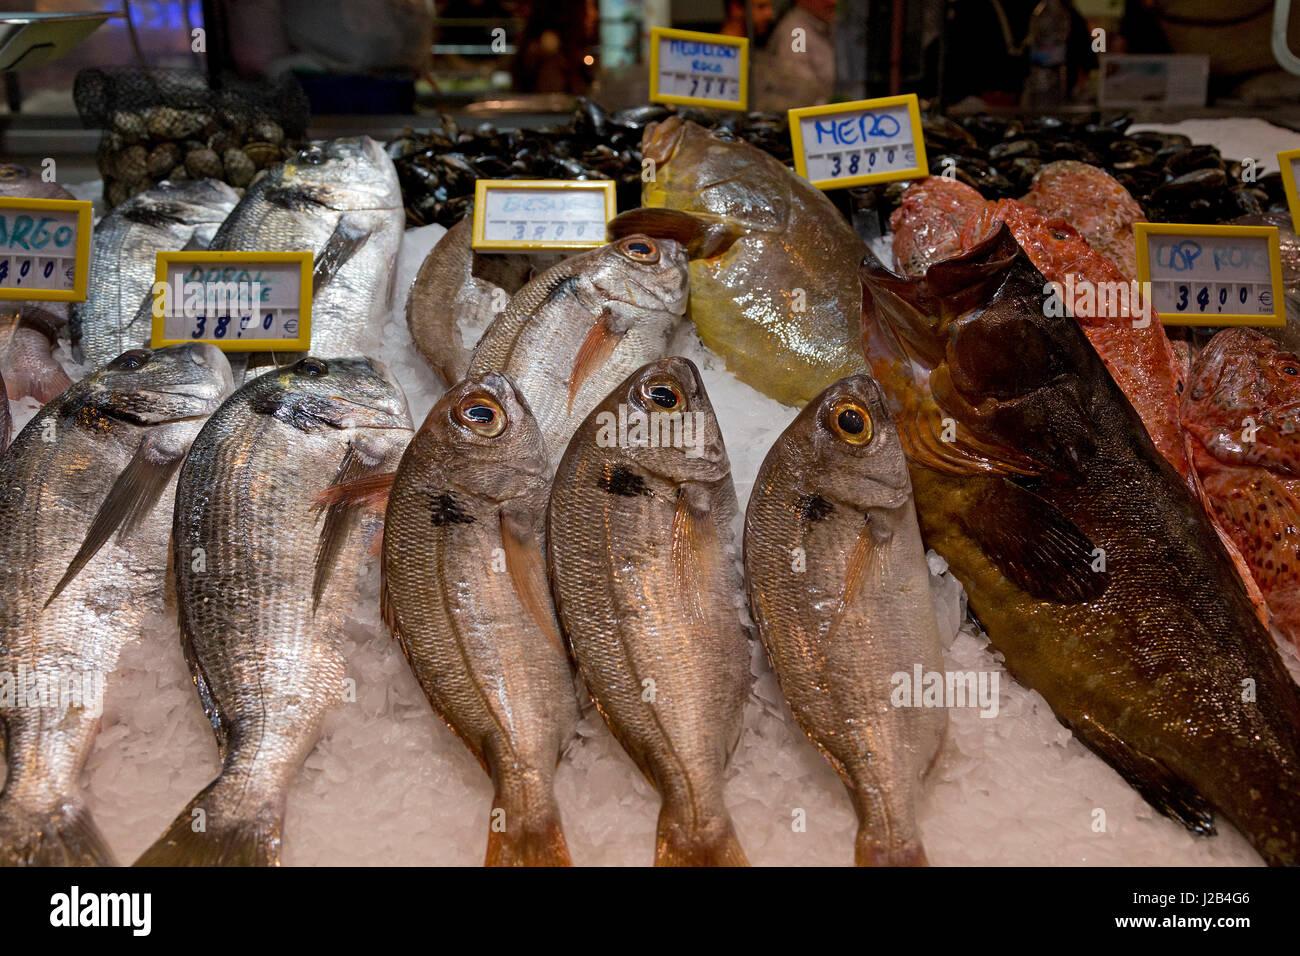 fish stall at Mercat de l´Olivar in Palma de Mallorca, Spain - Stock Image